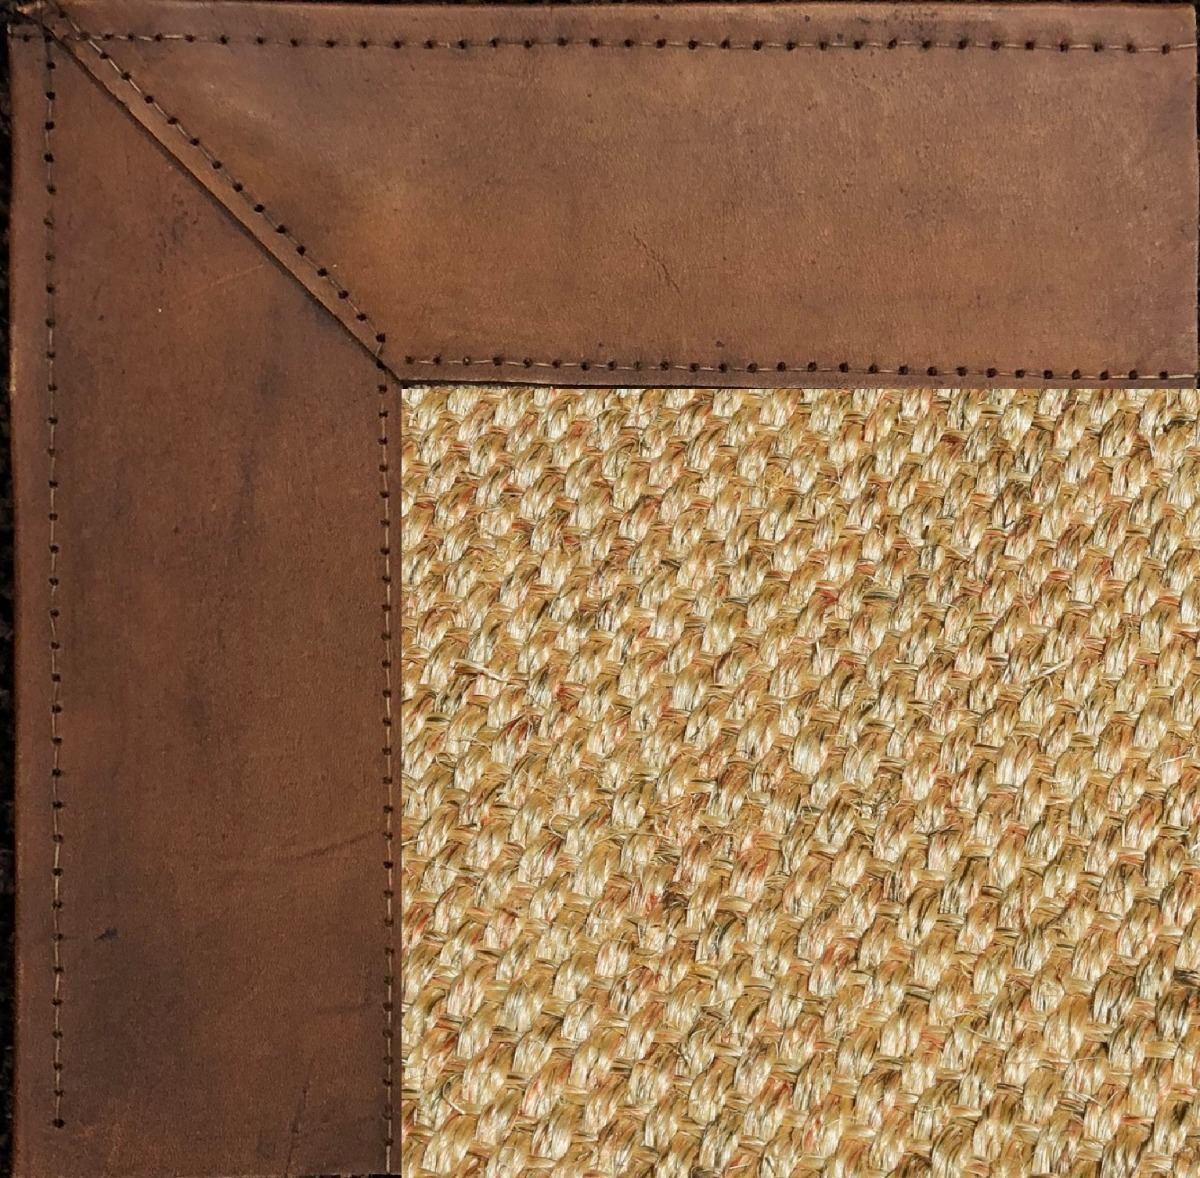 alfombra sisal sintético - guarda cuero (5 cm) - 1.50 x 2.00 - u$s